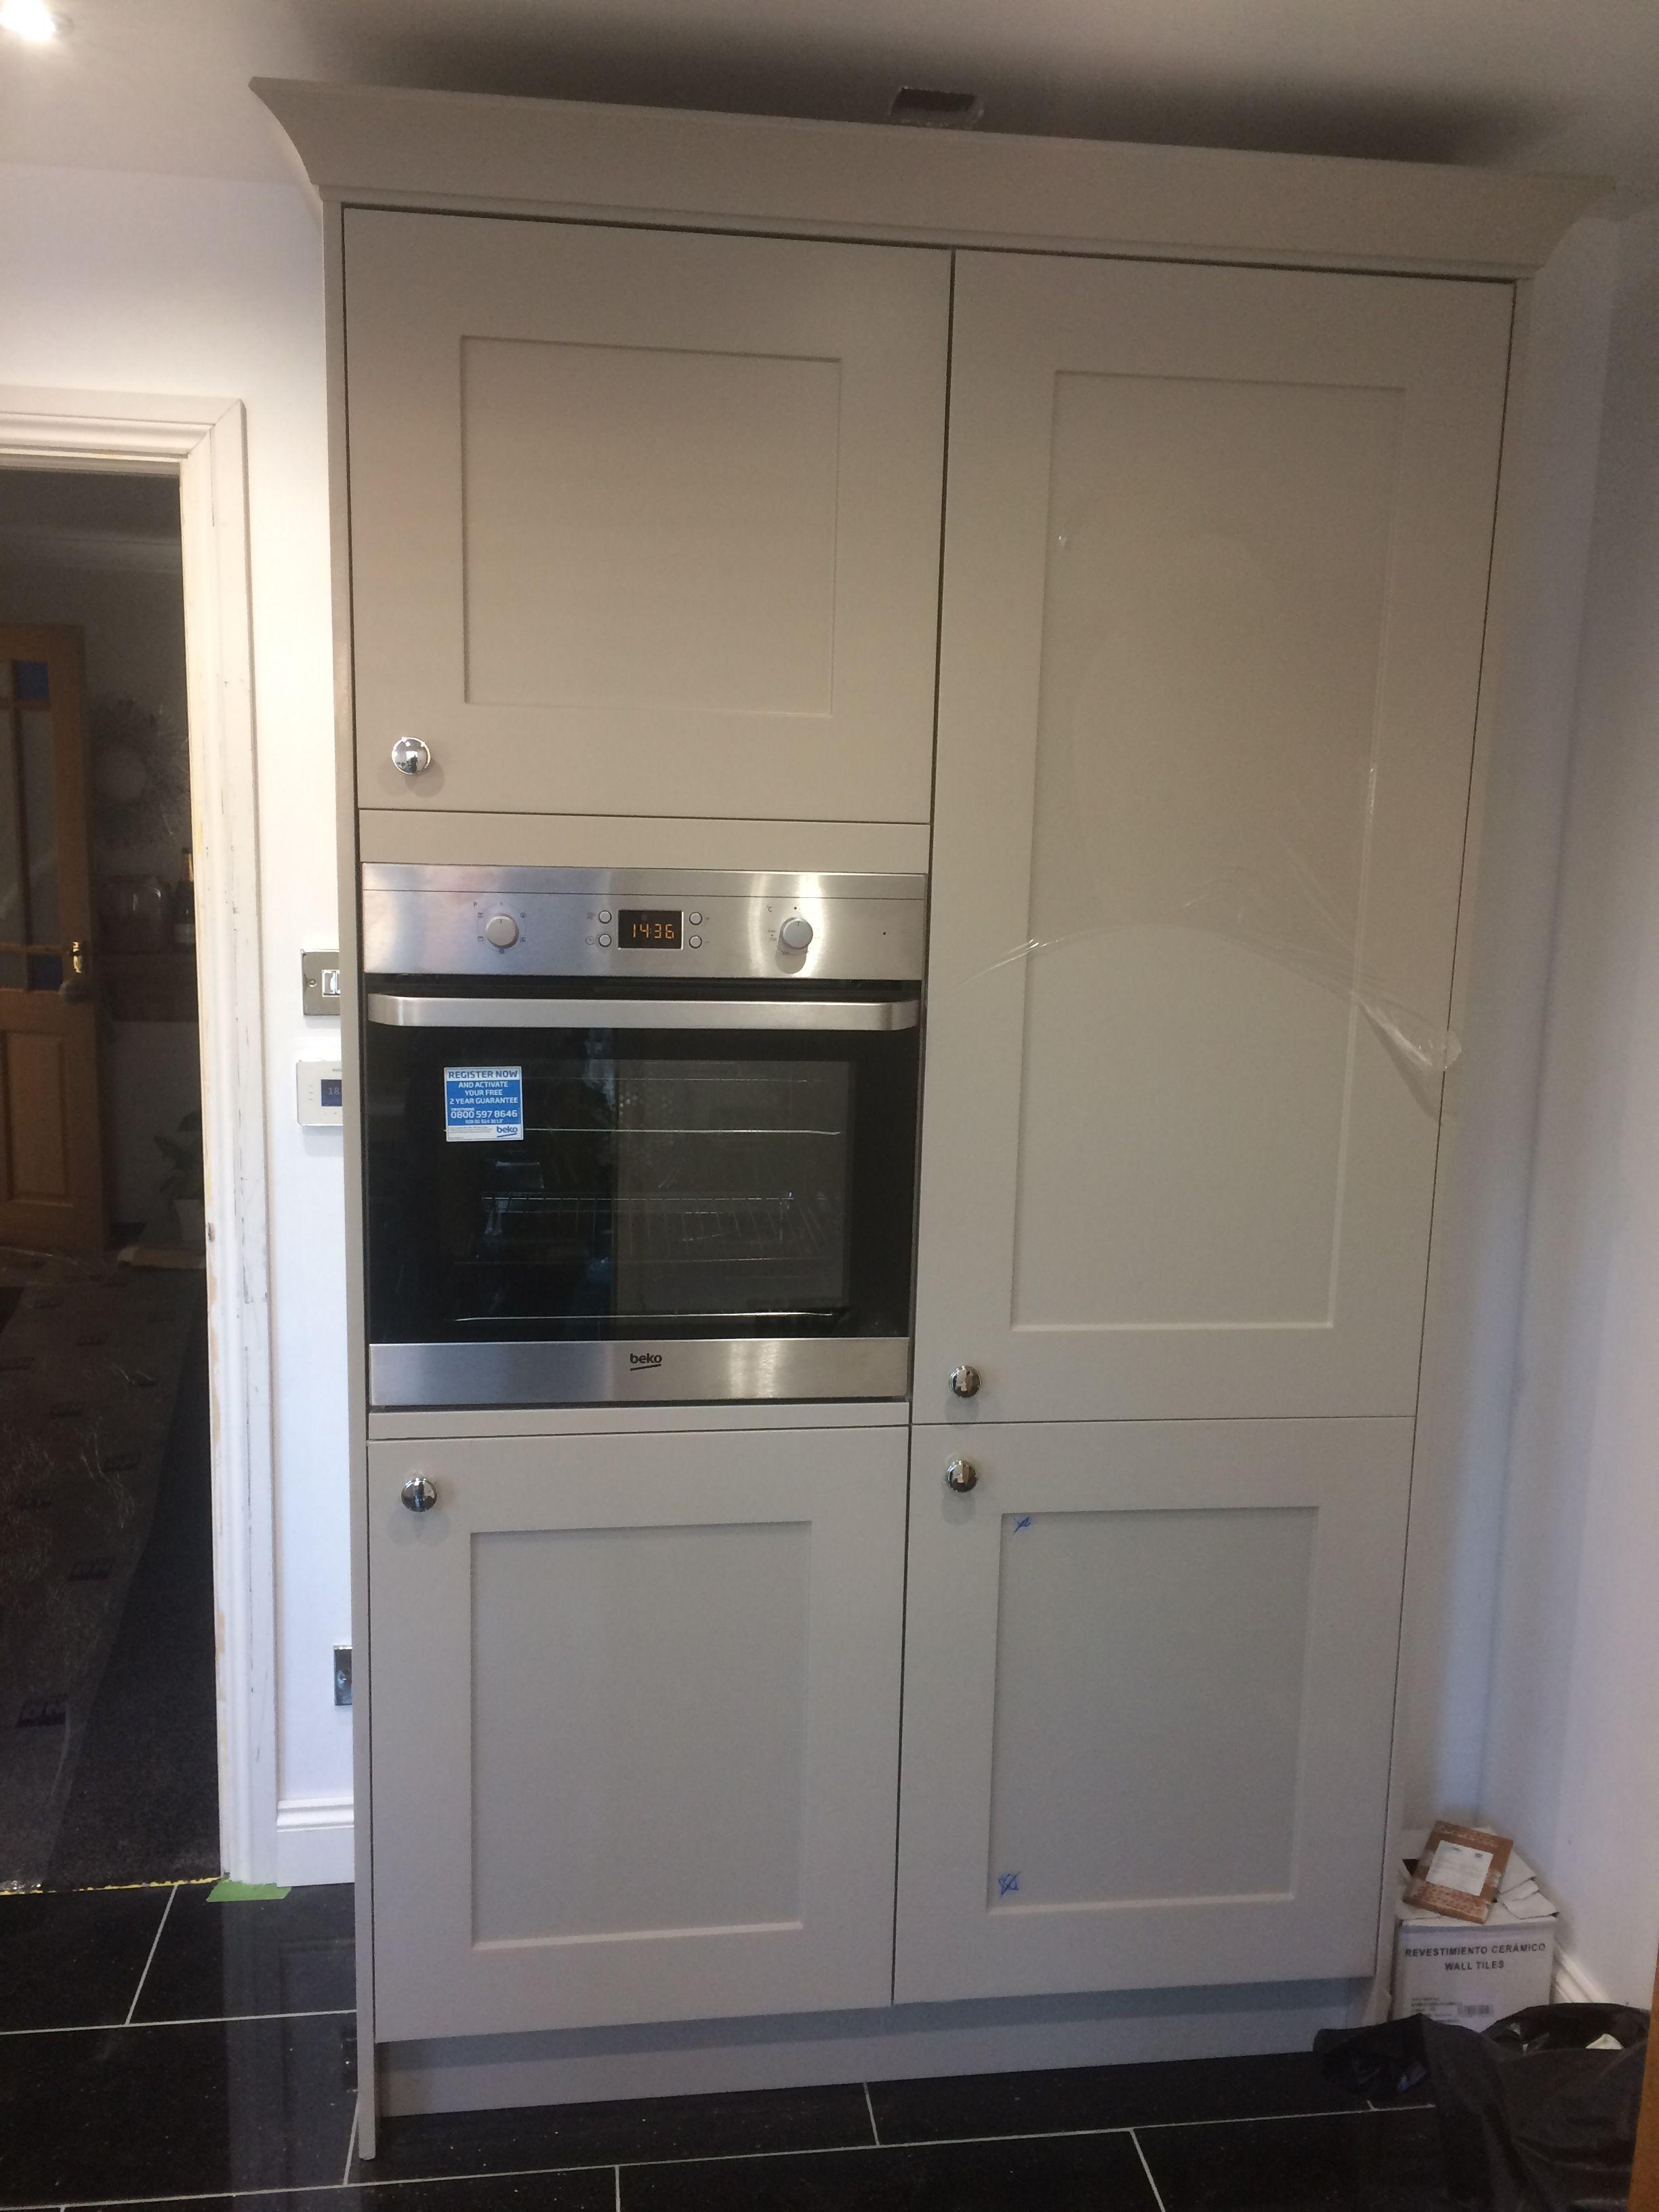 Beau Built In Fridge Freezer And Oven Housing Unit